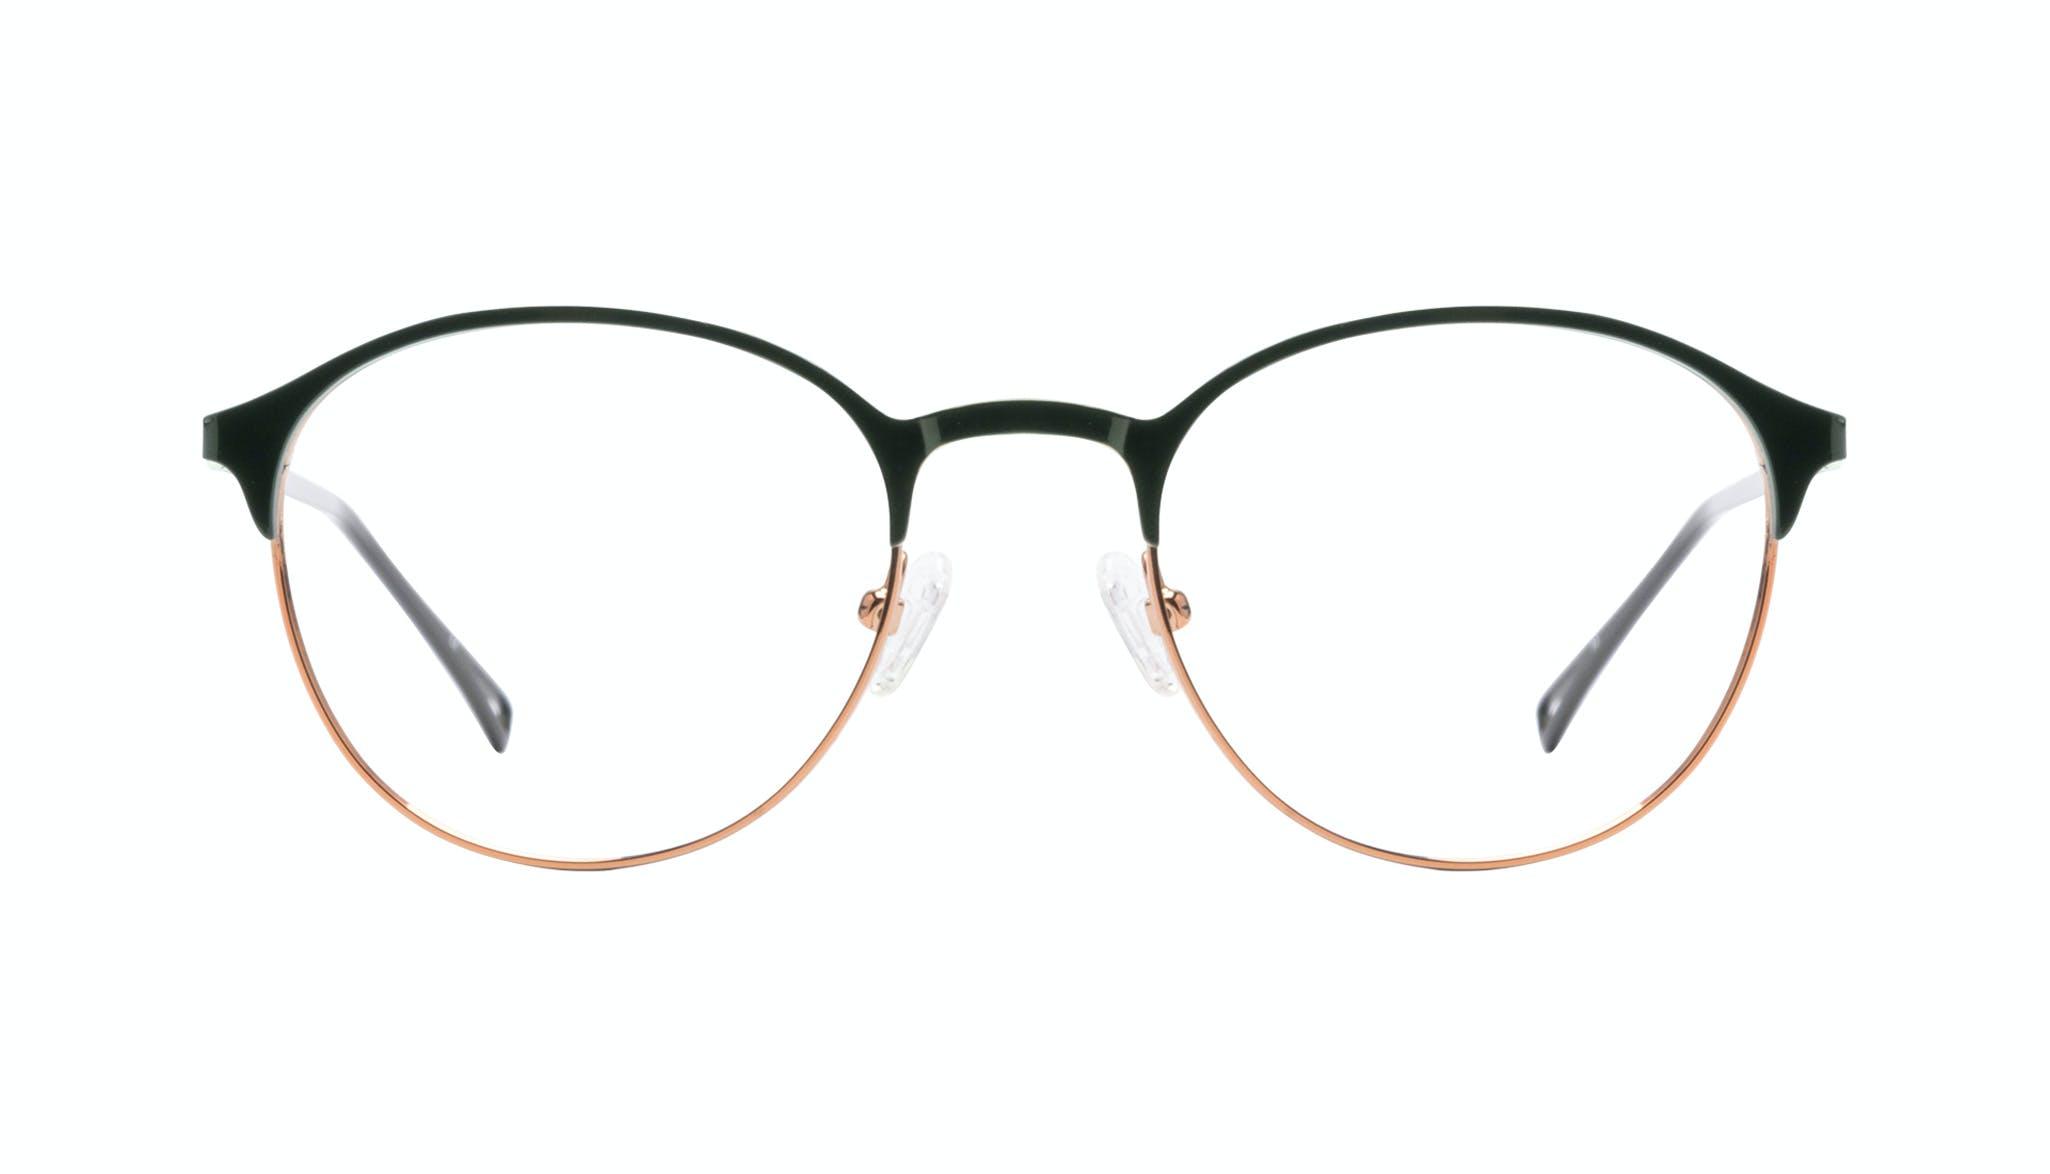 Affordable Fashion Glasses Round Eyeglasses Women Bay Emeraude Front